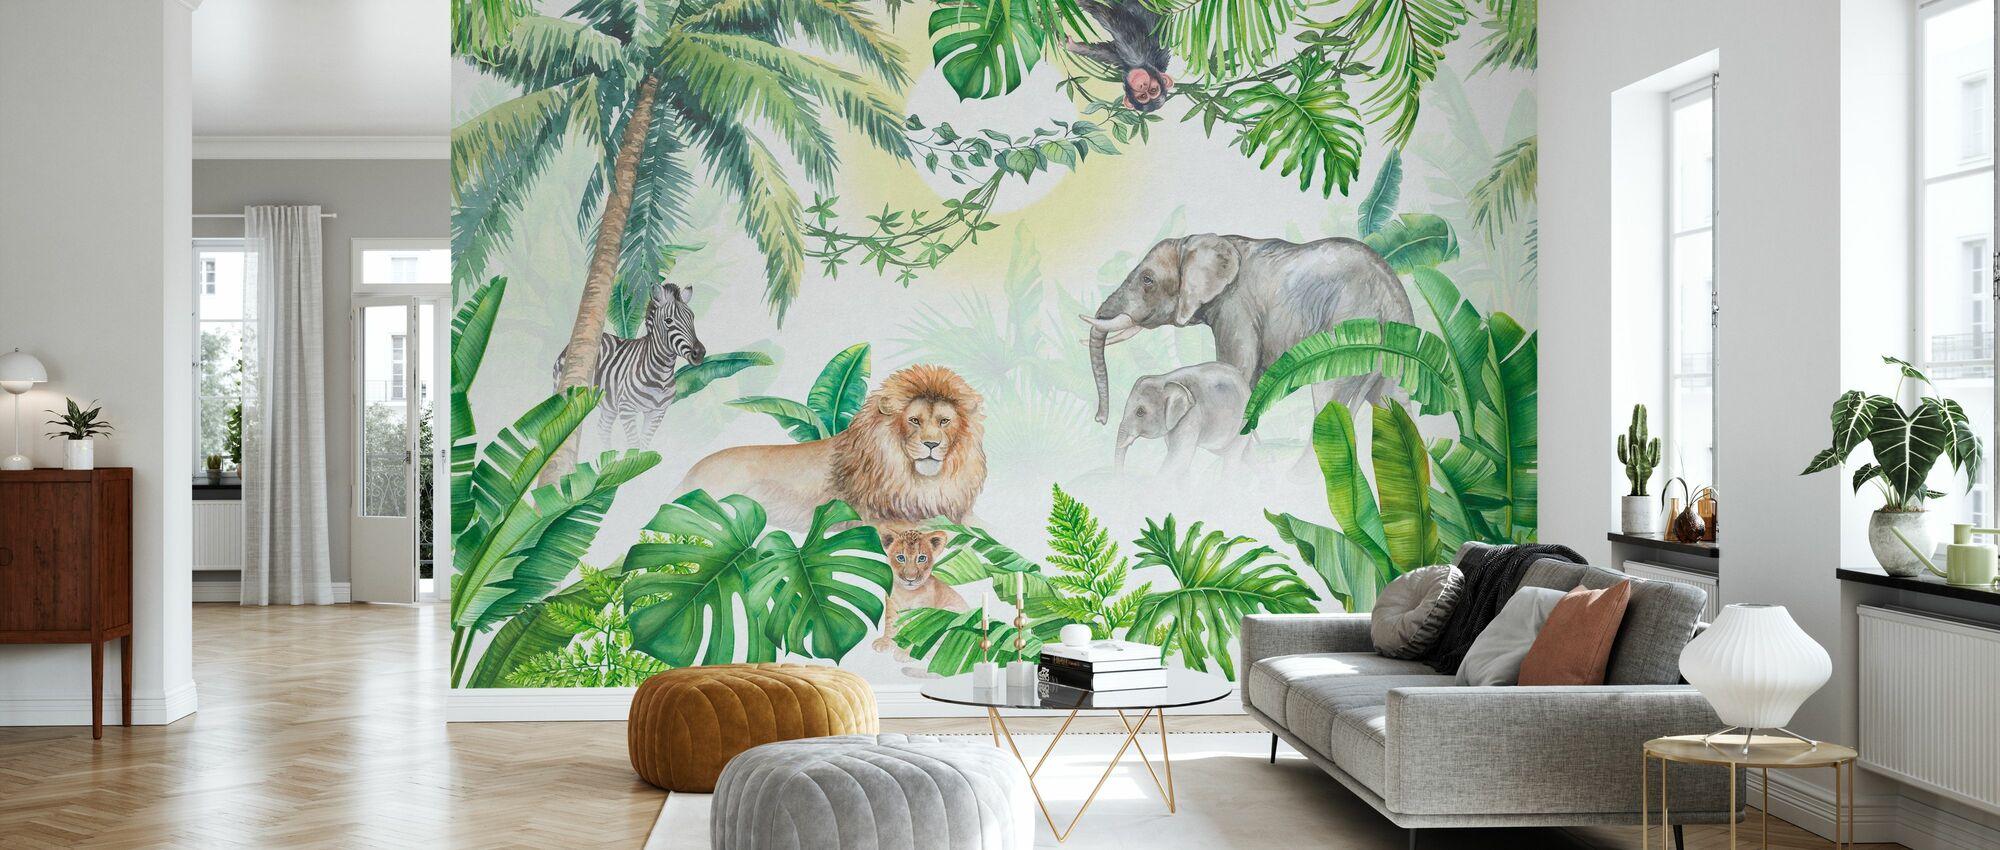 Jungle Dieren - Behang - Woonkamer